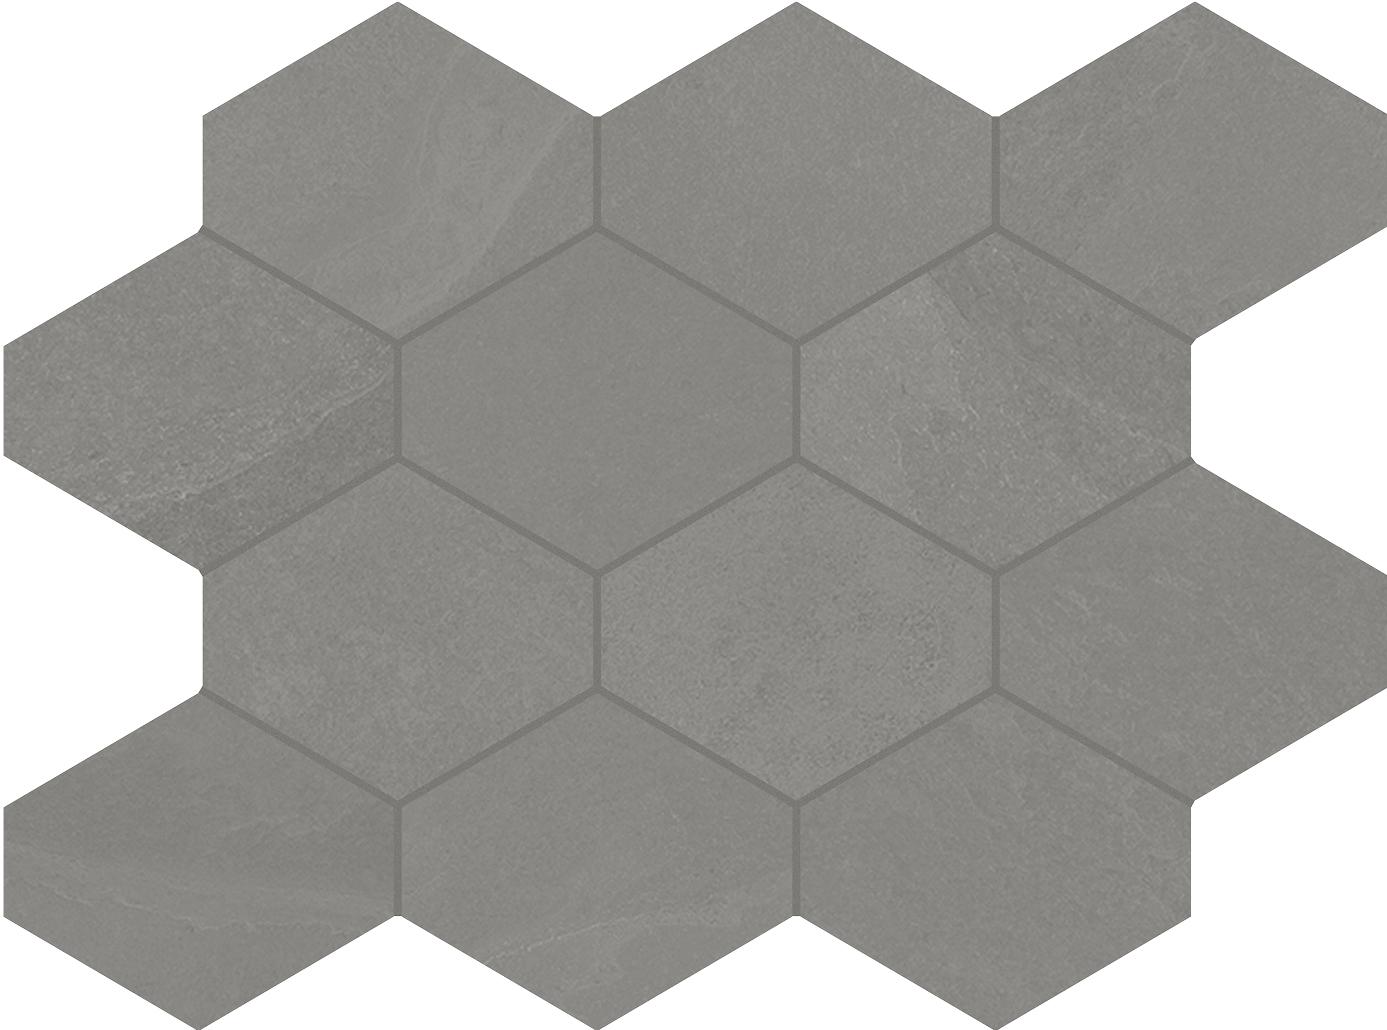 Unicom Starker BRAZILIAN SLATE Silk Grey Hexagon UNI-0008492 Mosaik 25x34 Matt